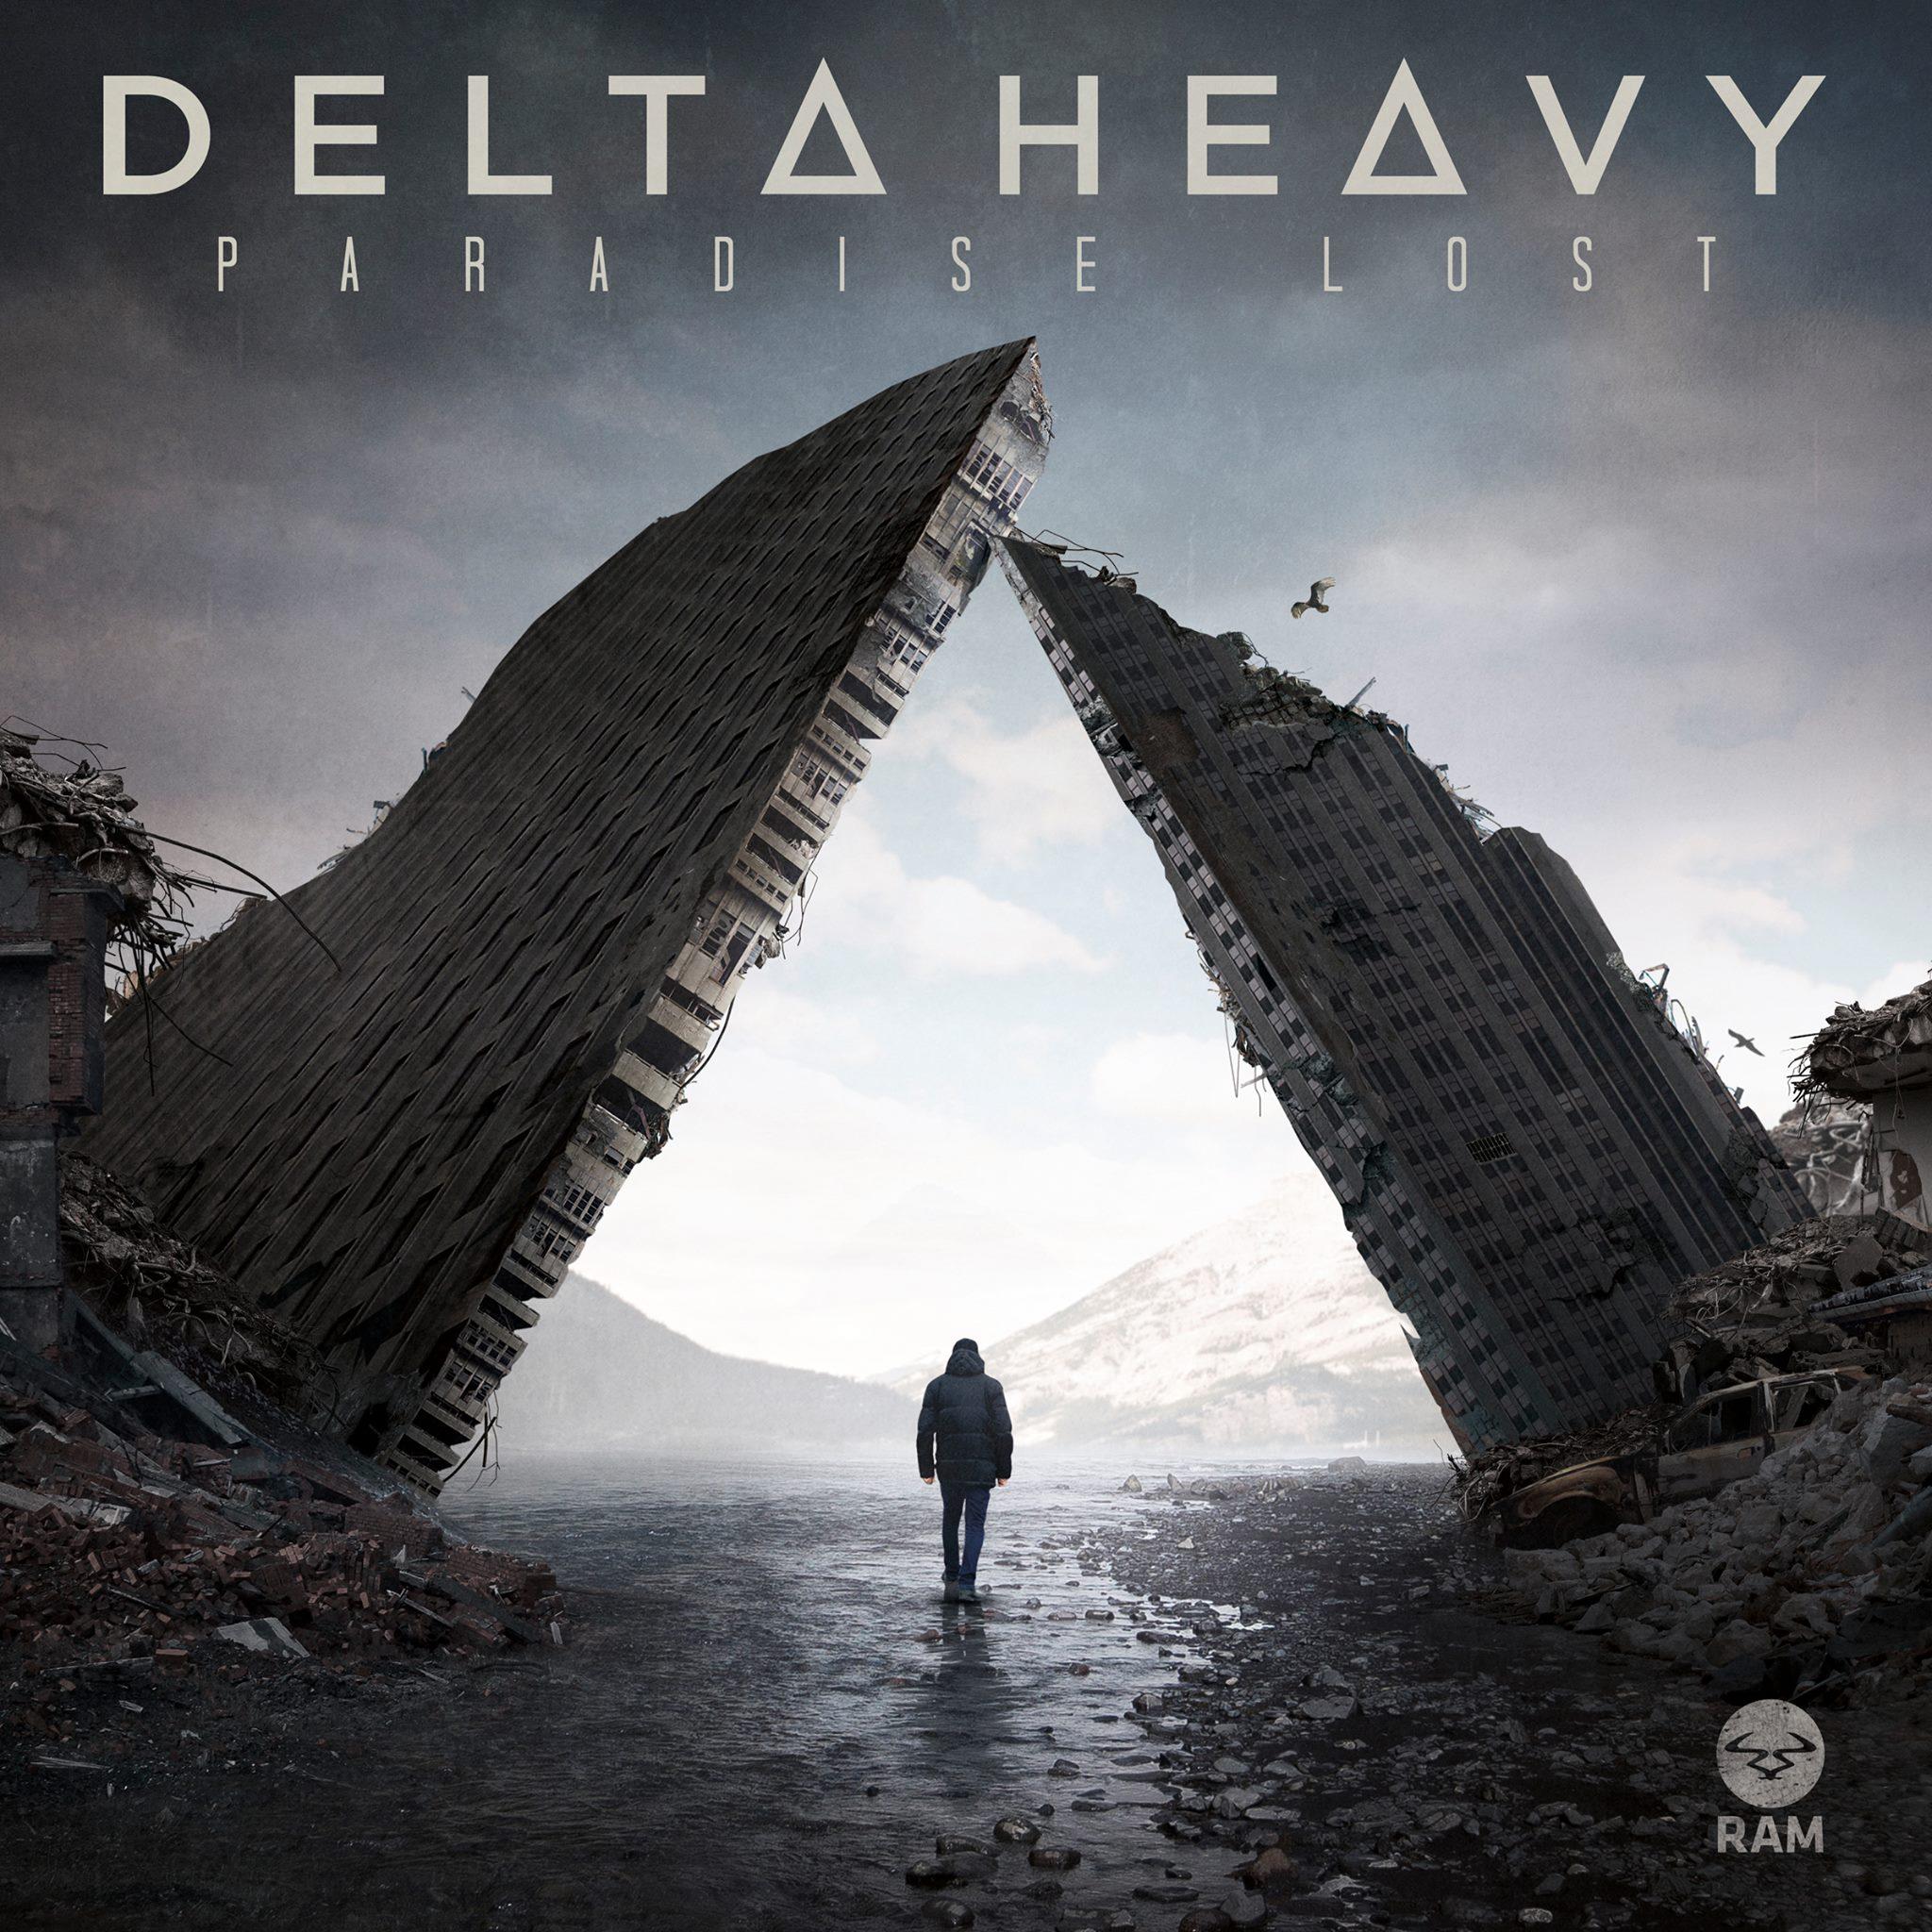 Delta Heavy/PARADISE LOST DLP